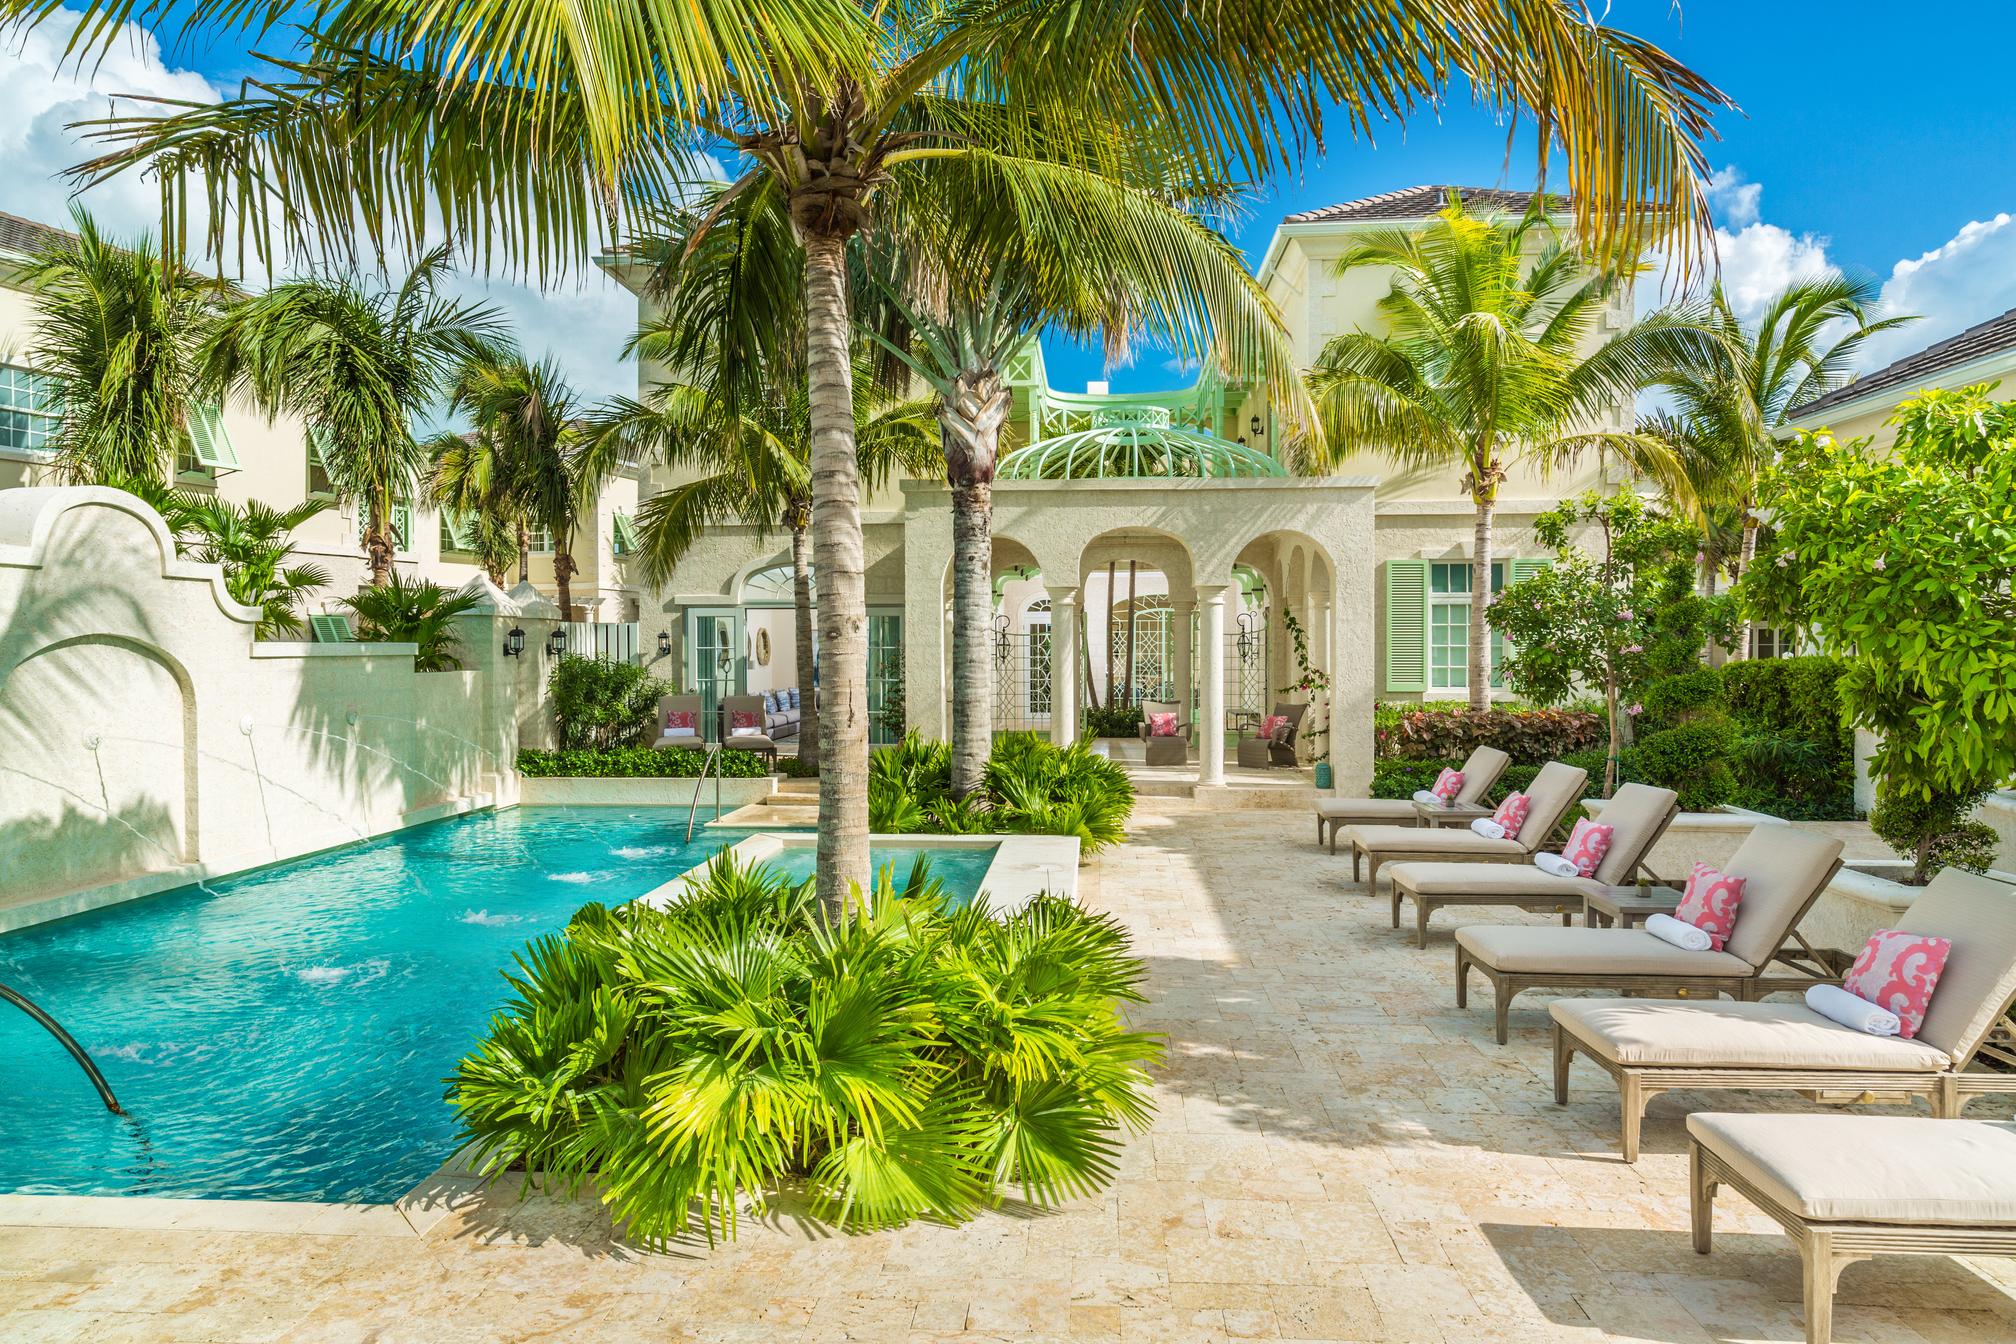 The Shore Club Villas Turks And Caicos Photo Blog The Shore Club